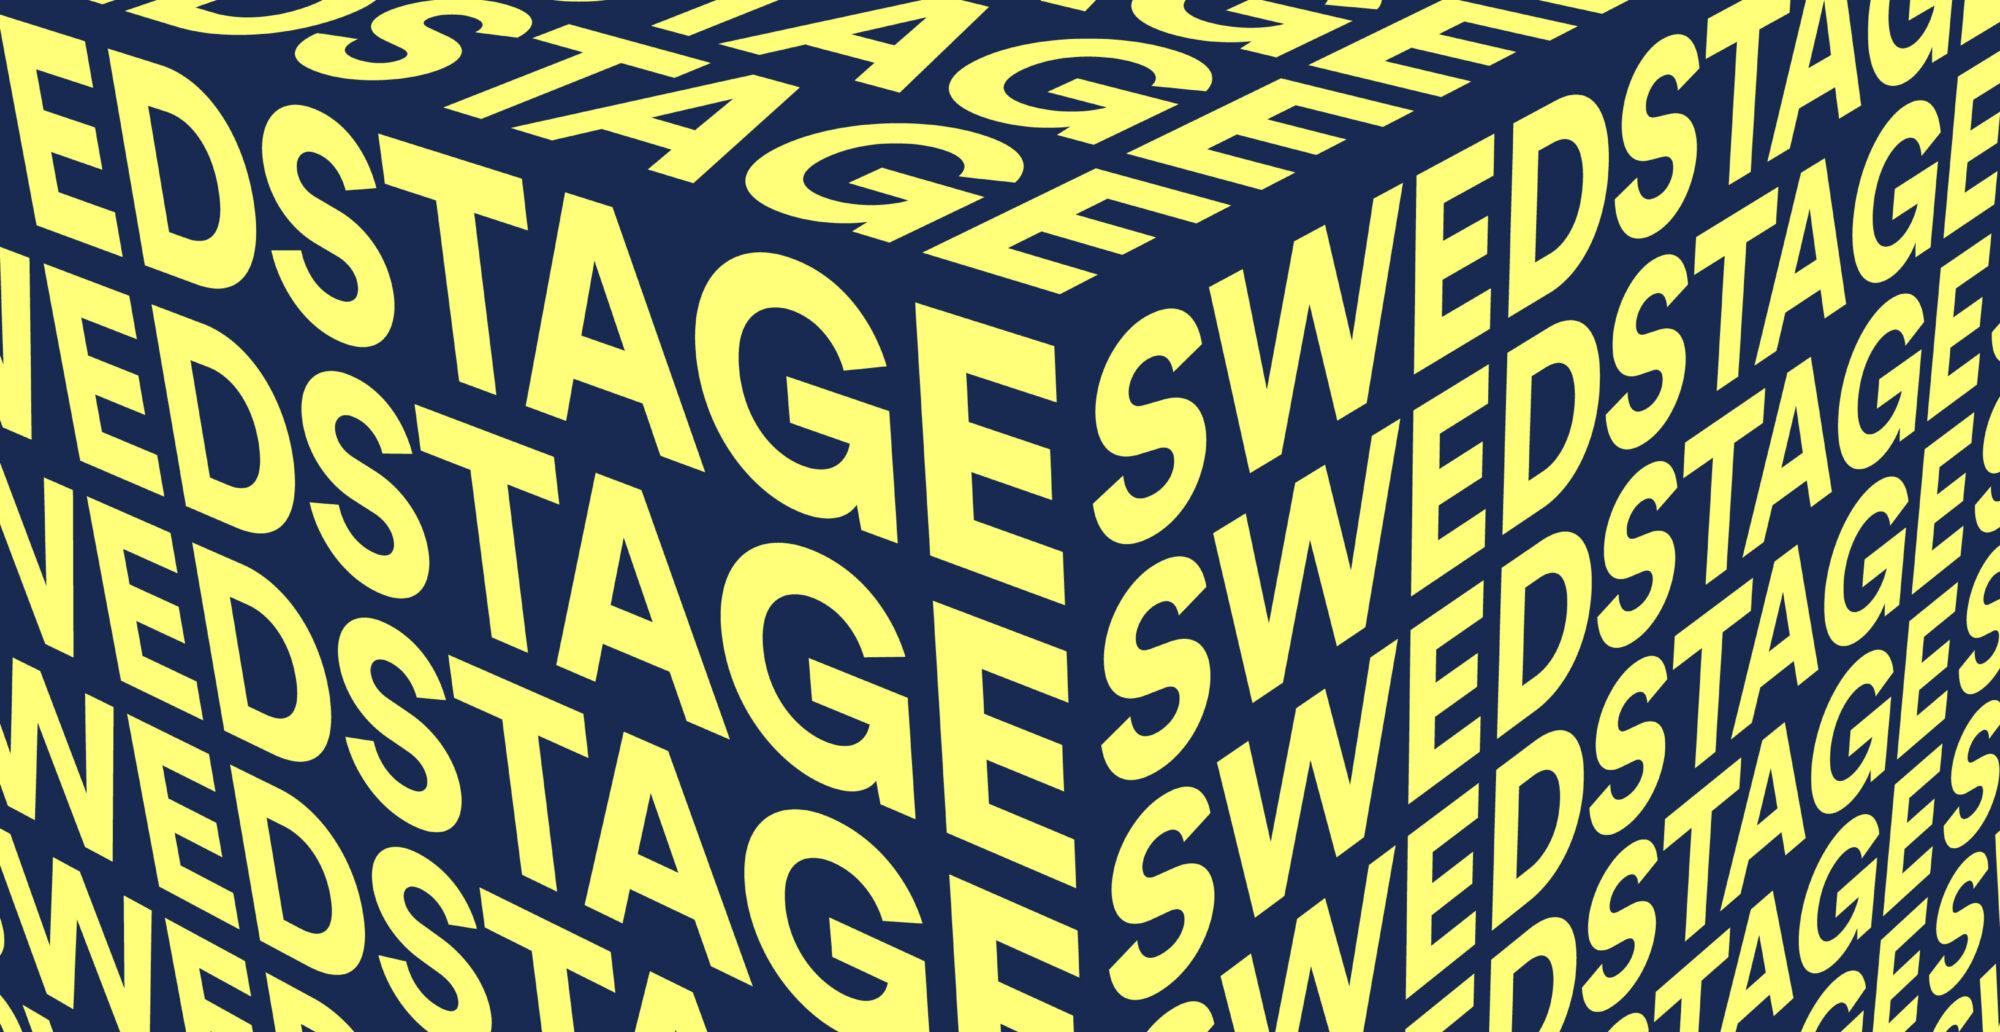 SWEDSTAGE